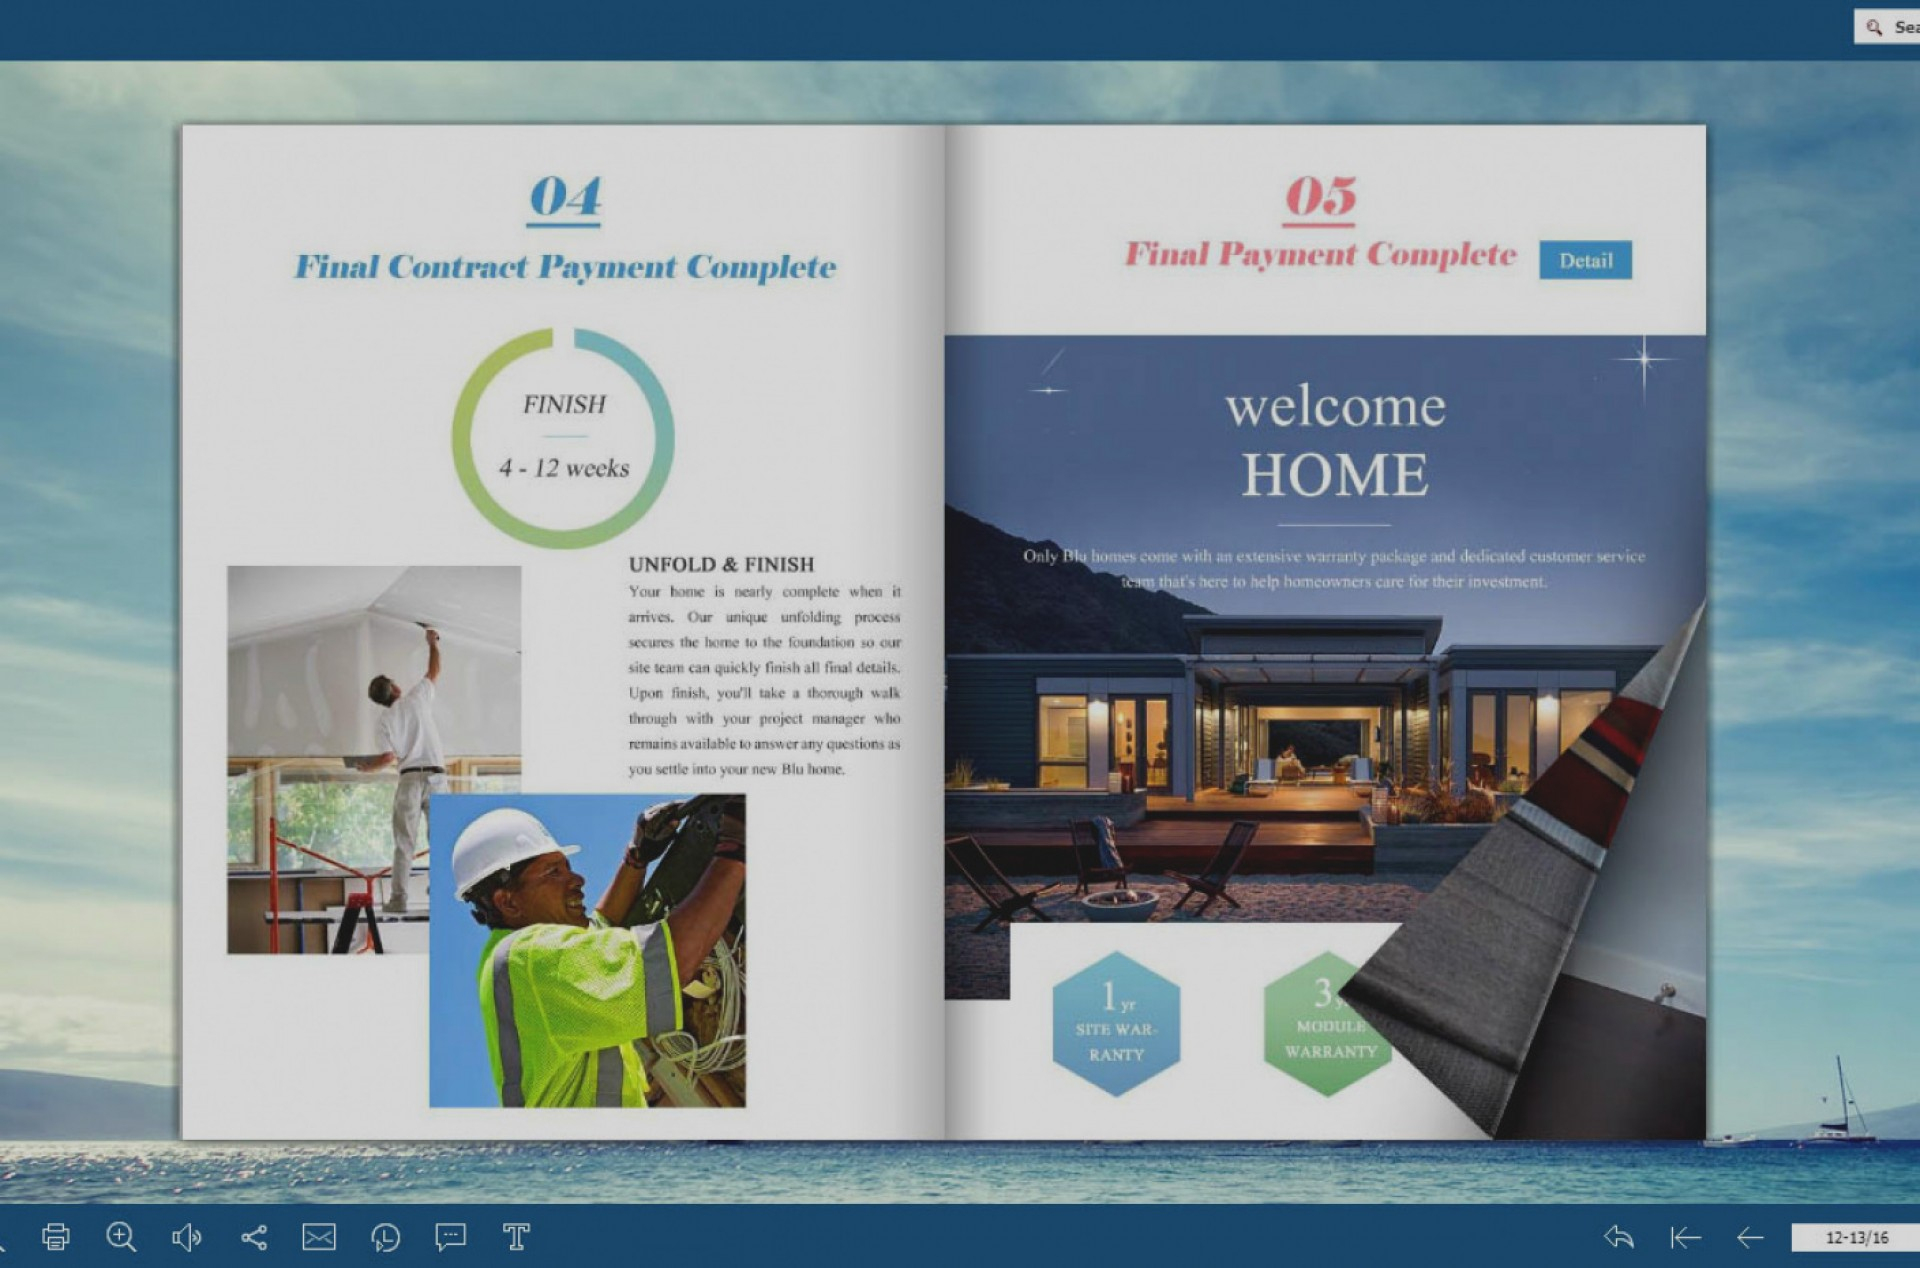 002 Free Online Brochure Templates Template Ideas Pictures Maker - Online Brochure Maker Free Printable